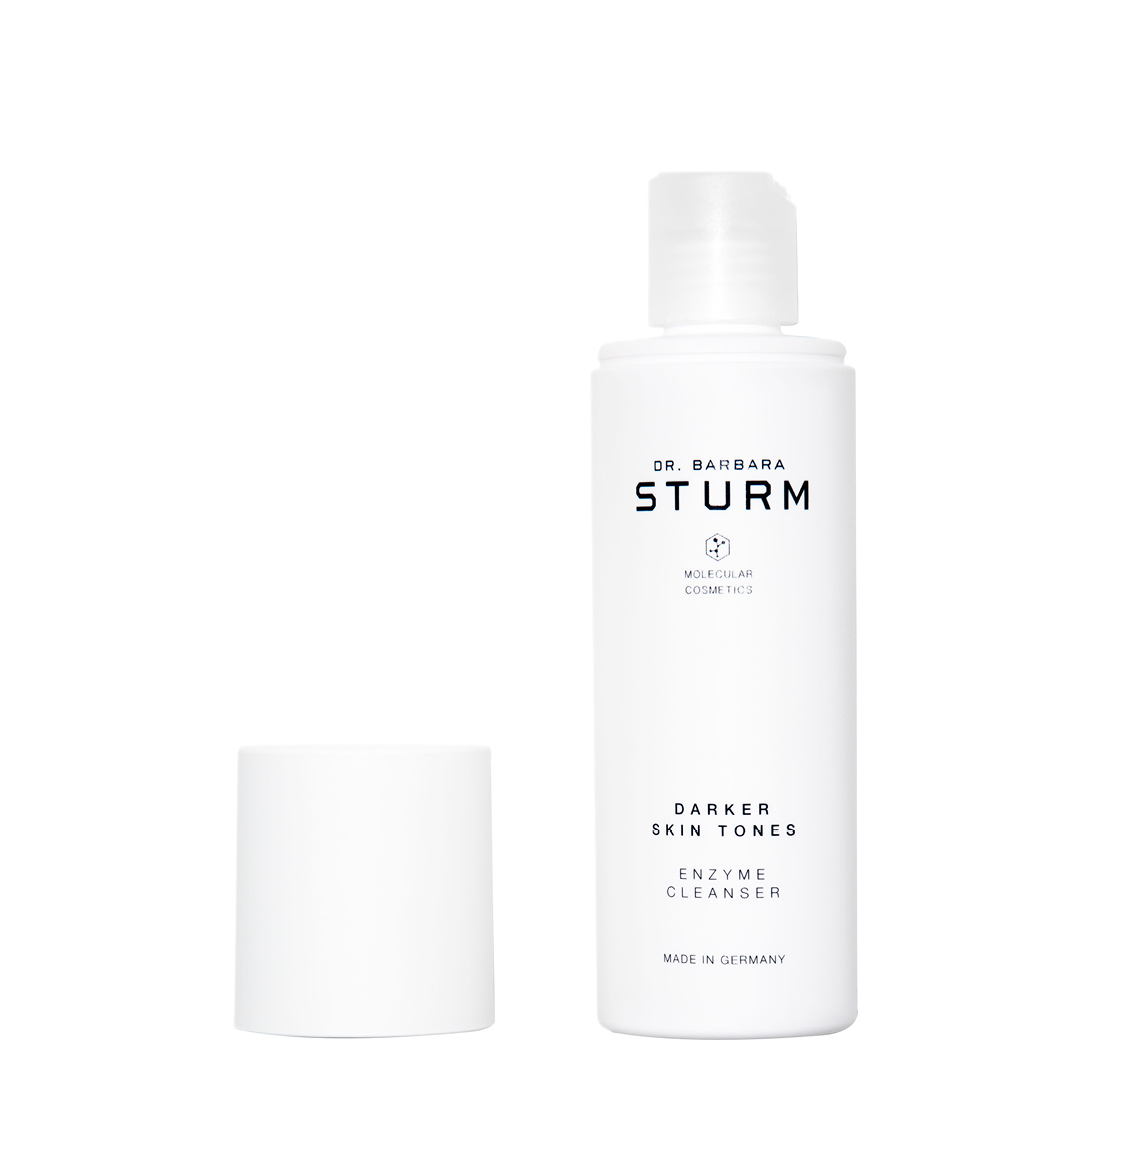 Dr. Barbara Sturm Darker Skin Tones Enzyme Cleanser 75g